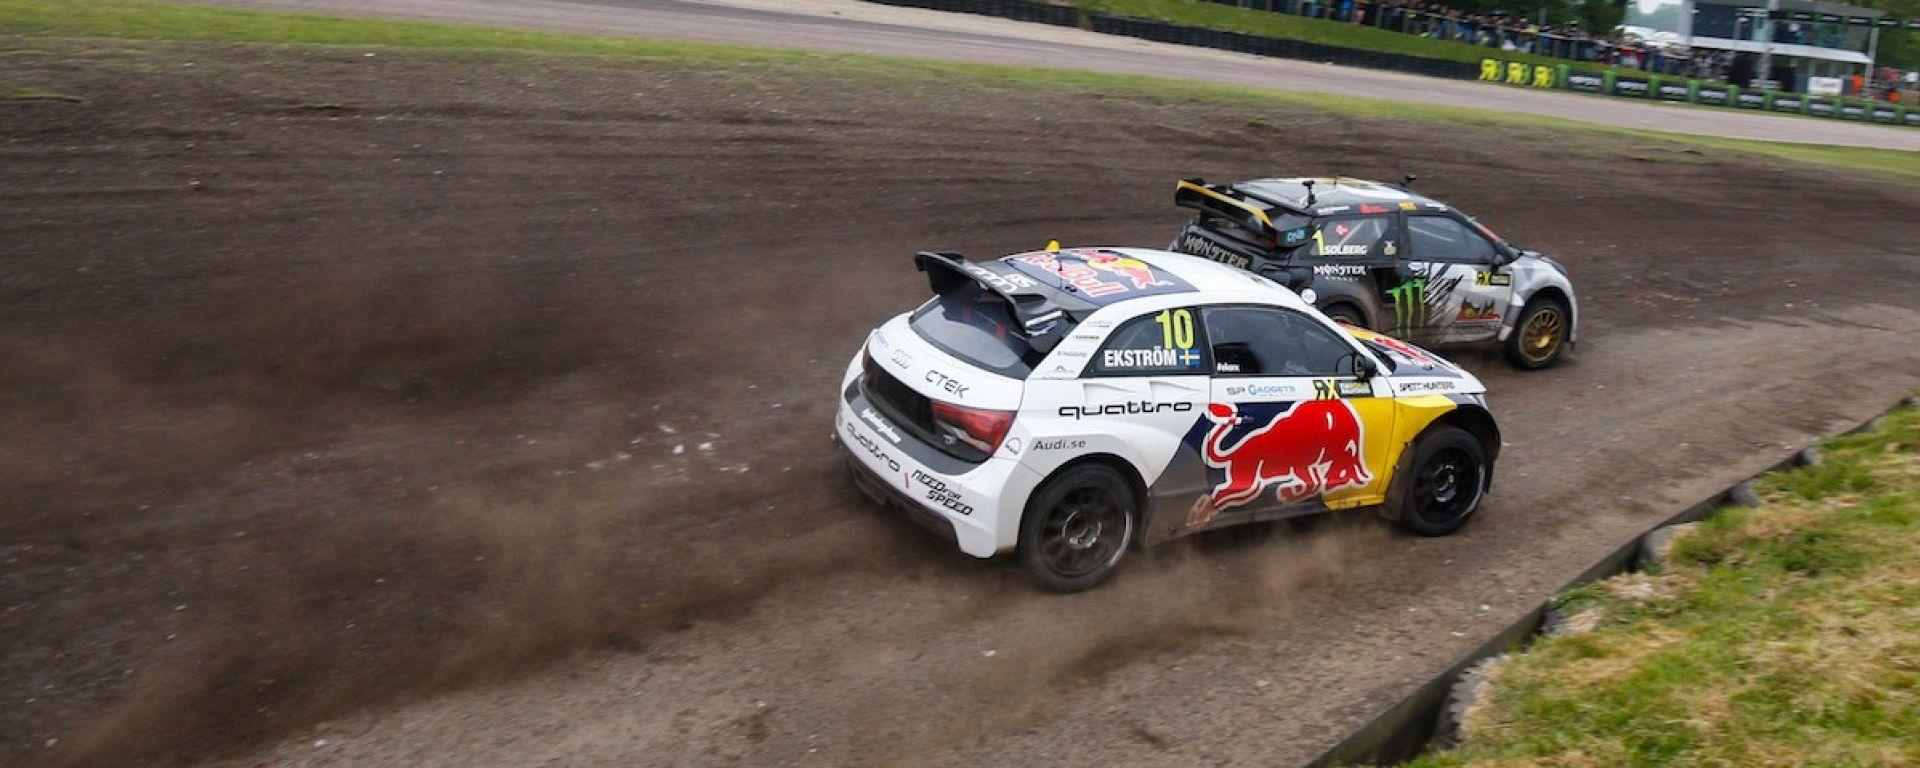 Rallycross 2016 - RD11 Circuito di Germania - Info